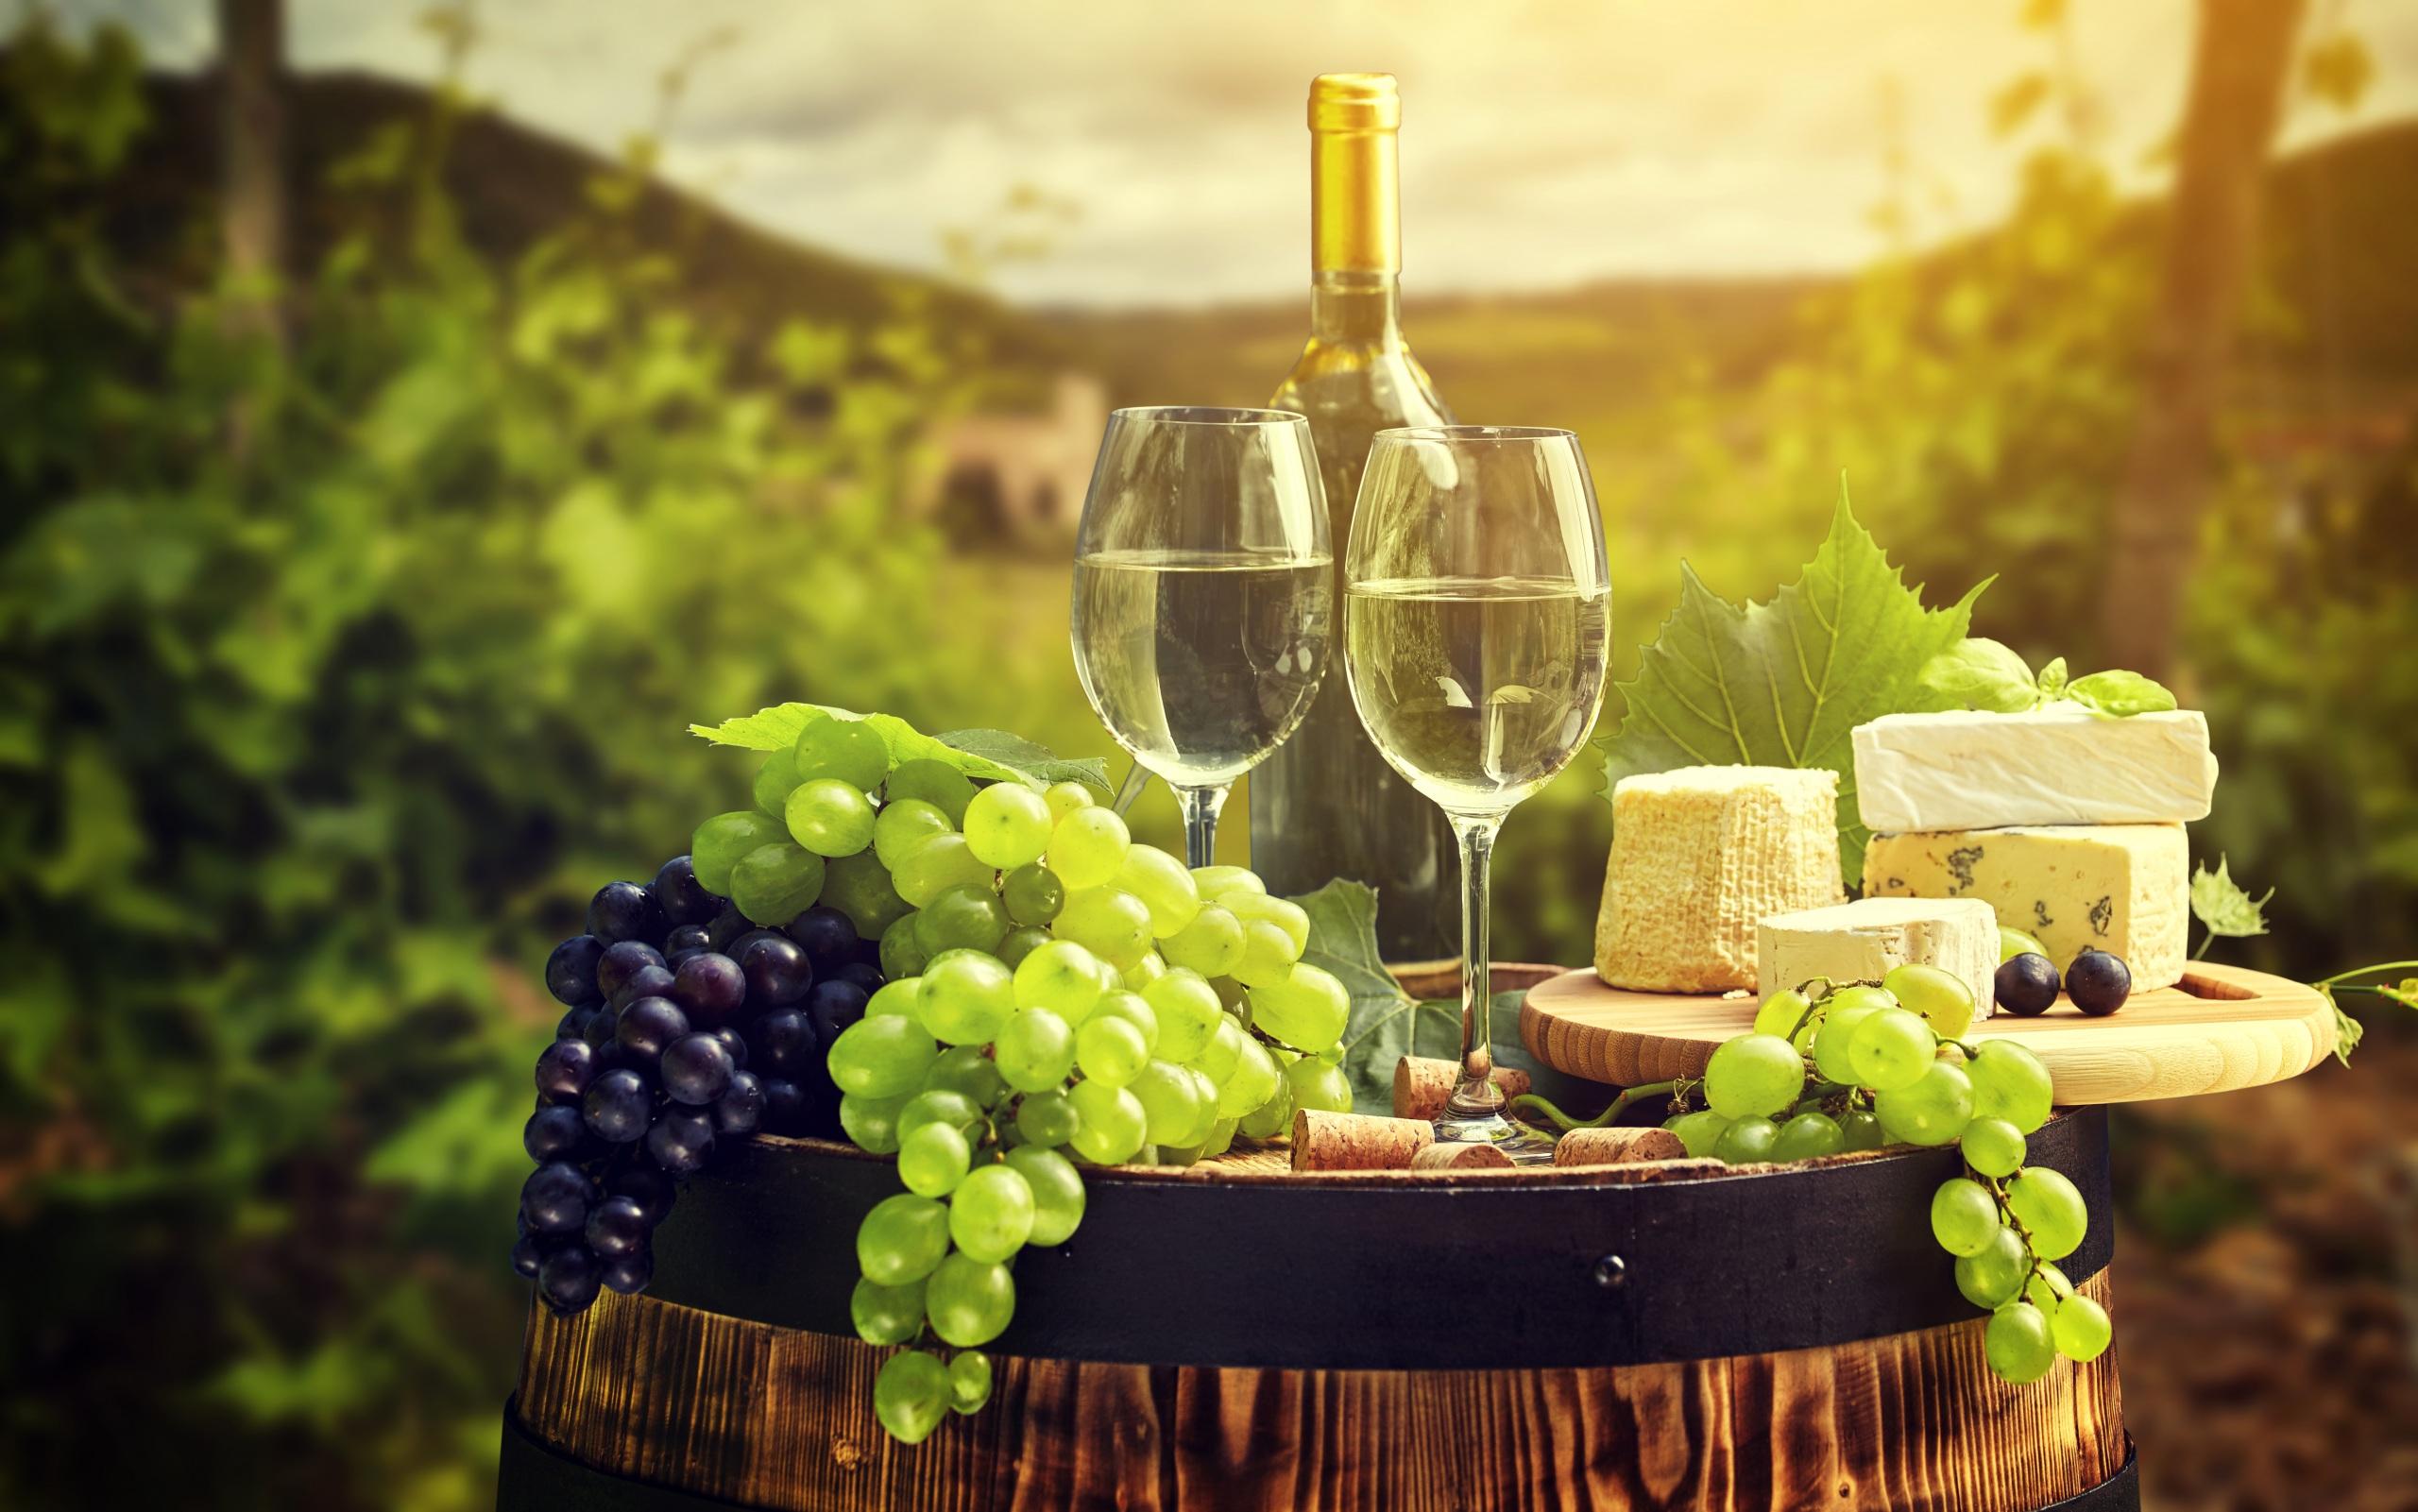 Фото Вино Сыры Виноград Еда Бокалы бутылки 2560x1601 Пища бокал Бутылка Продукты питания